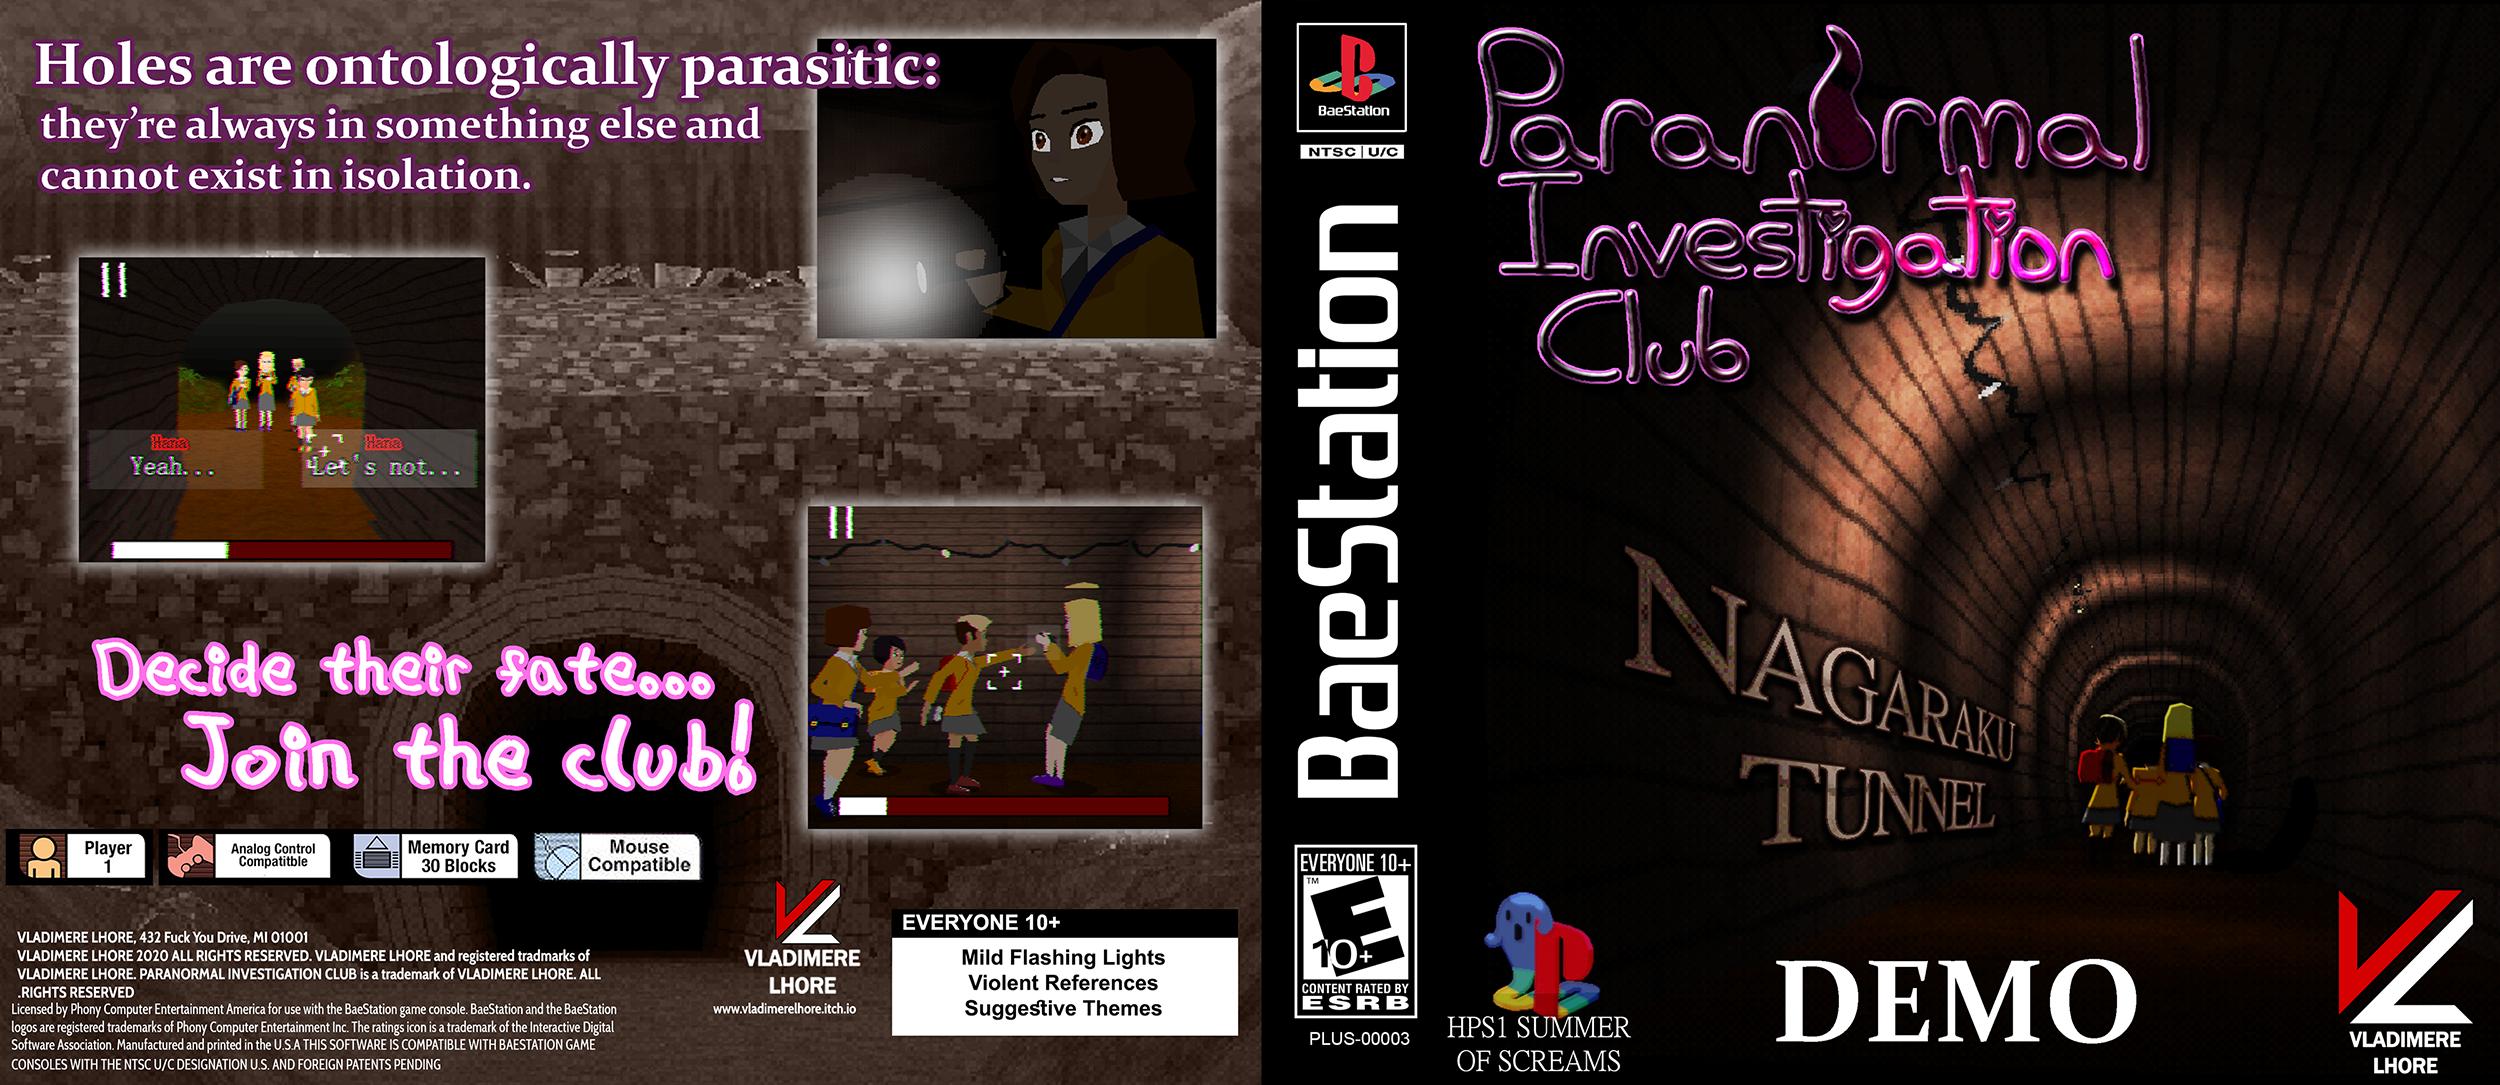 Paranormal Investigation Club : Nagaraku Tunnel (DEMO)